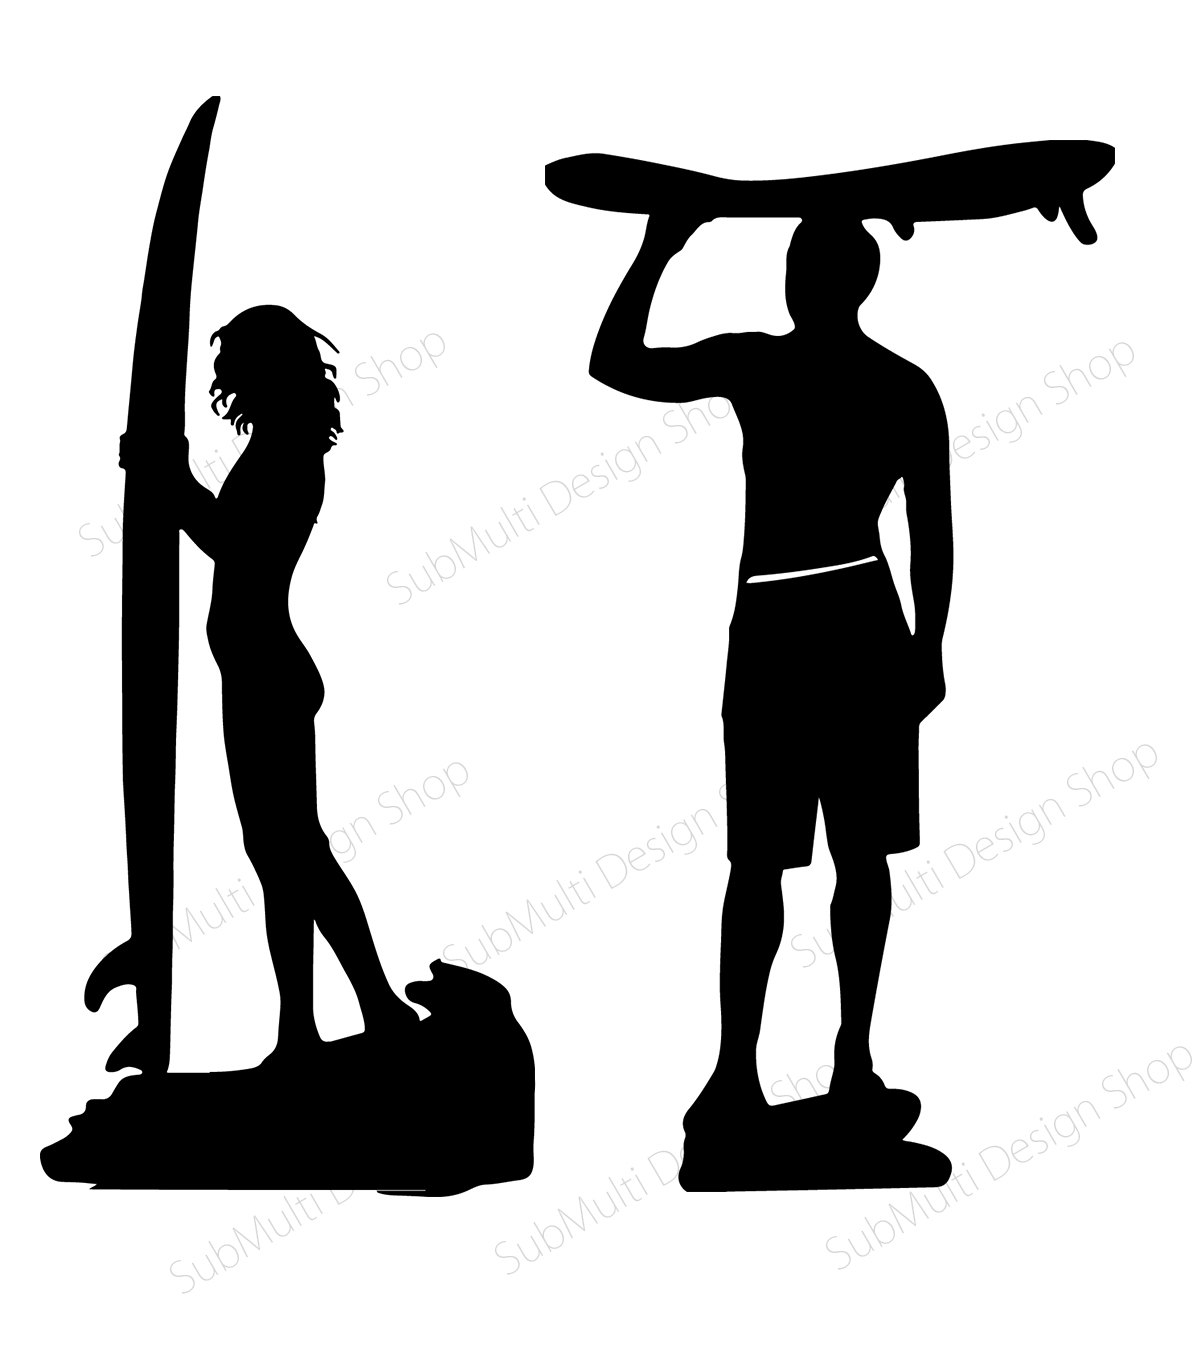 1200x1348 Surfers Silhouette Skateboard Silhouette Vector Surfers